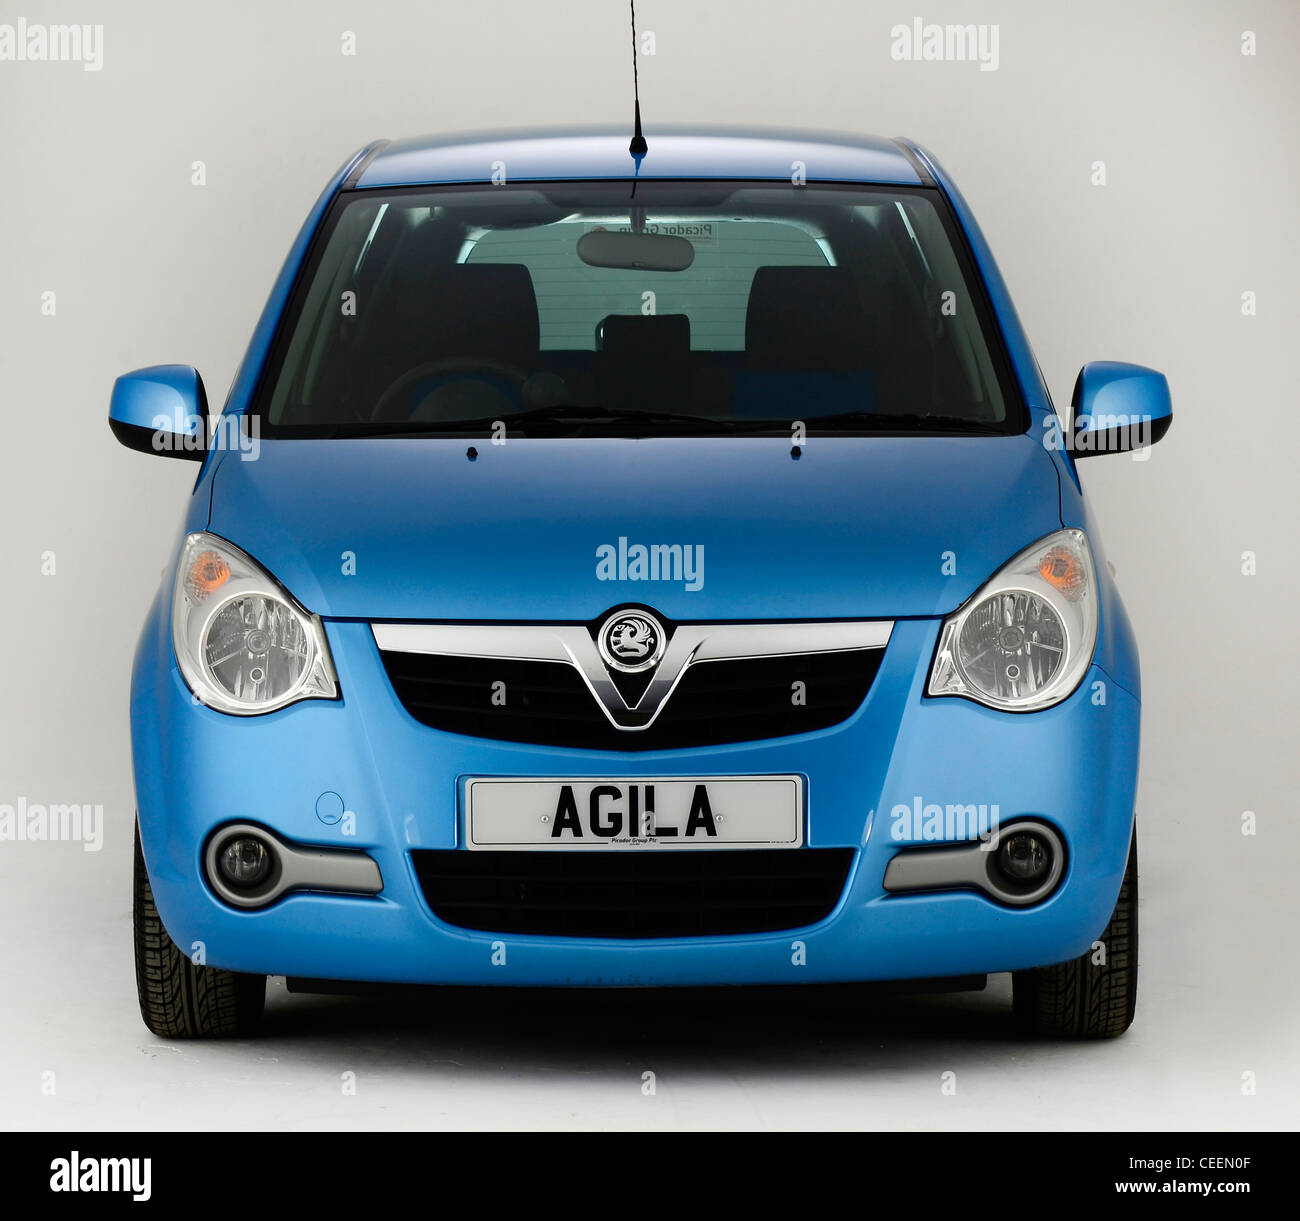 2010 Vauxhall Agila - Stock Image